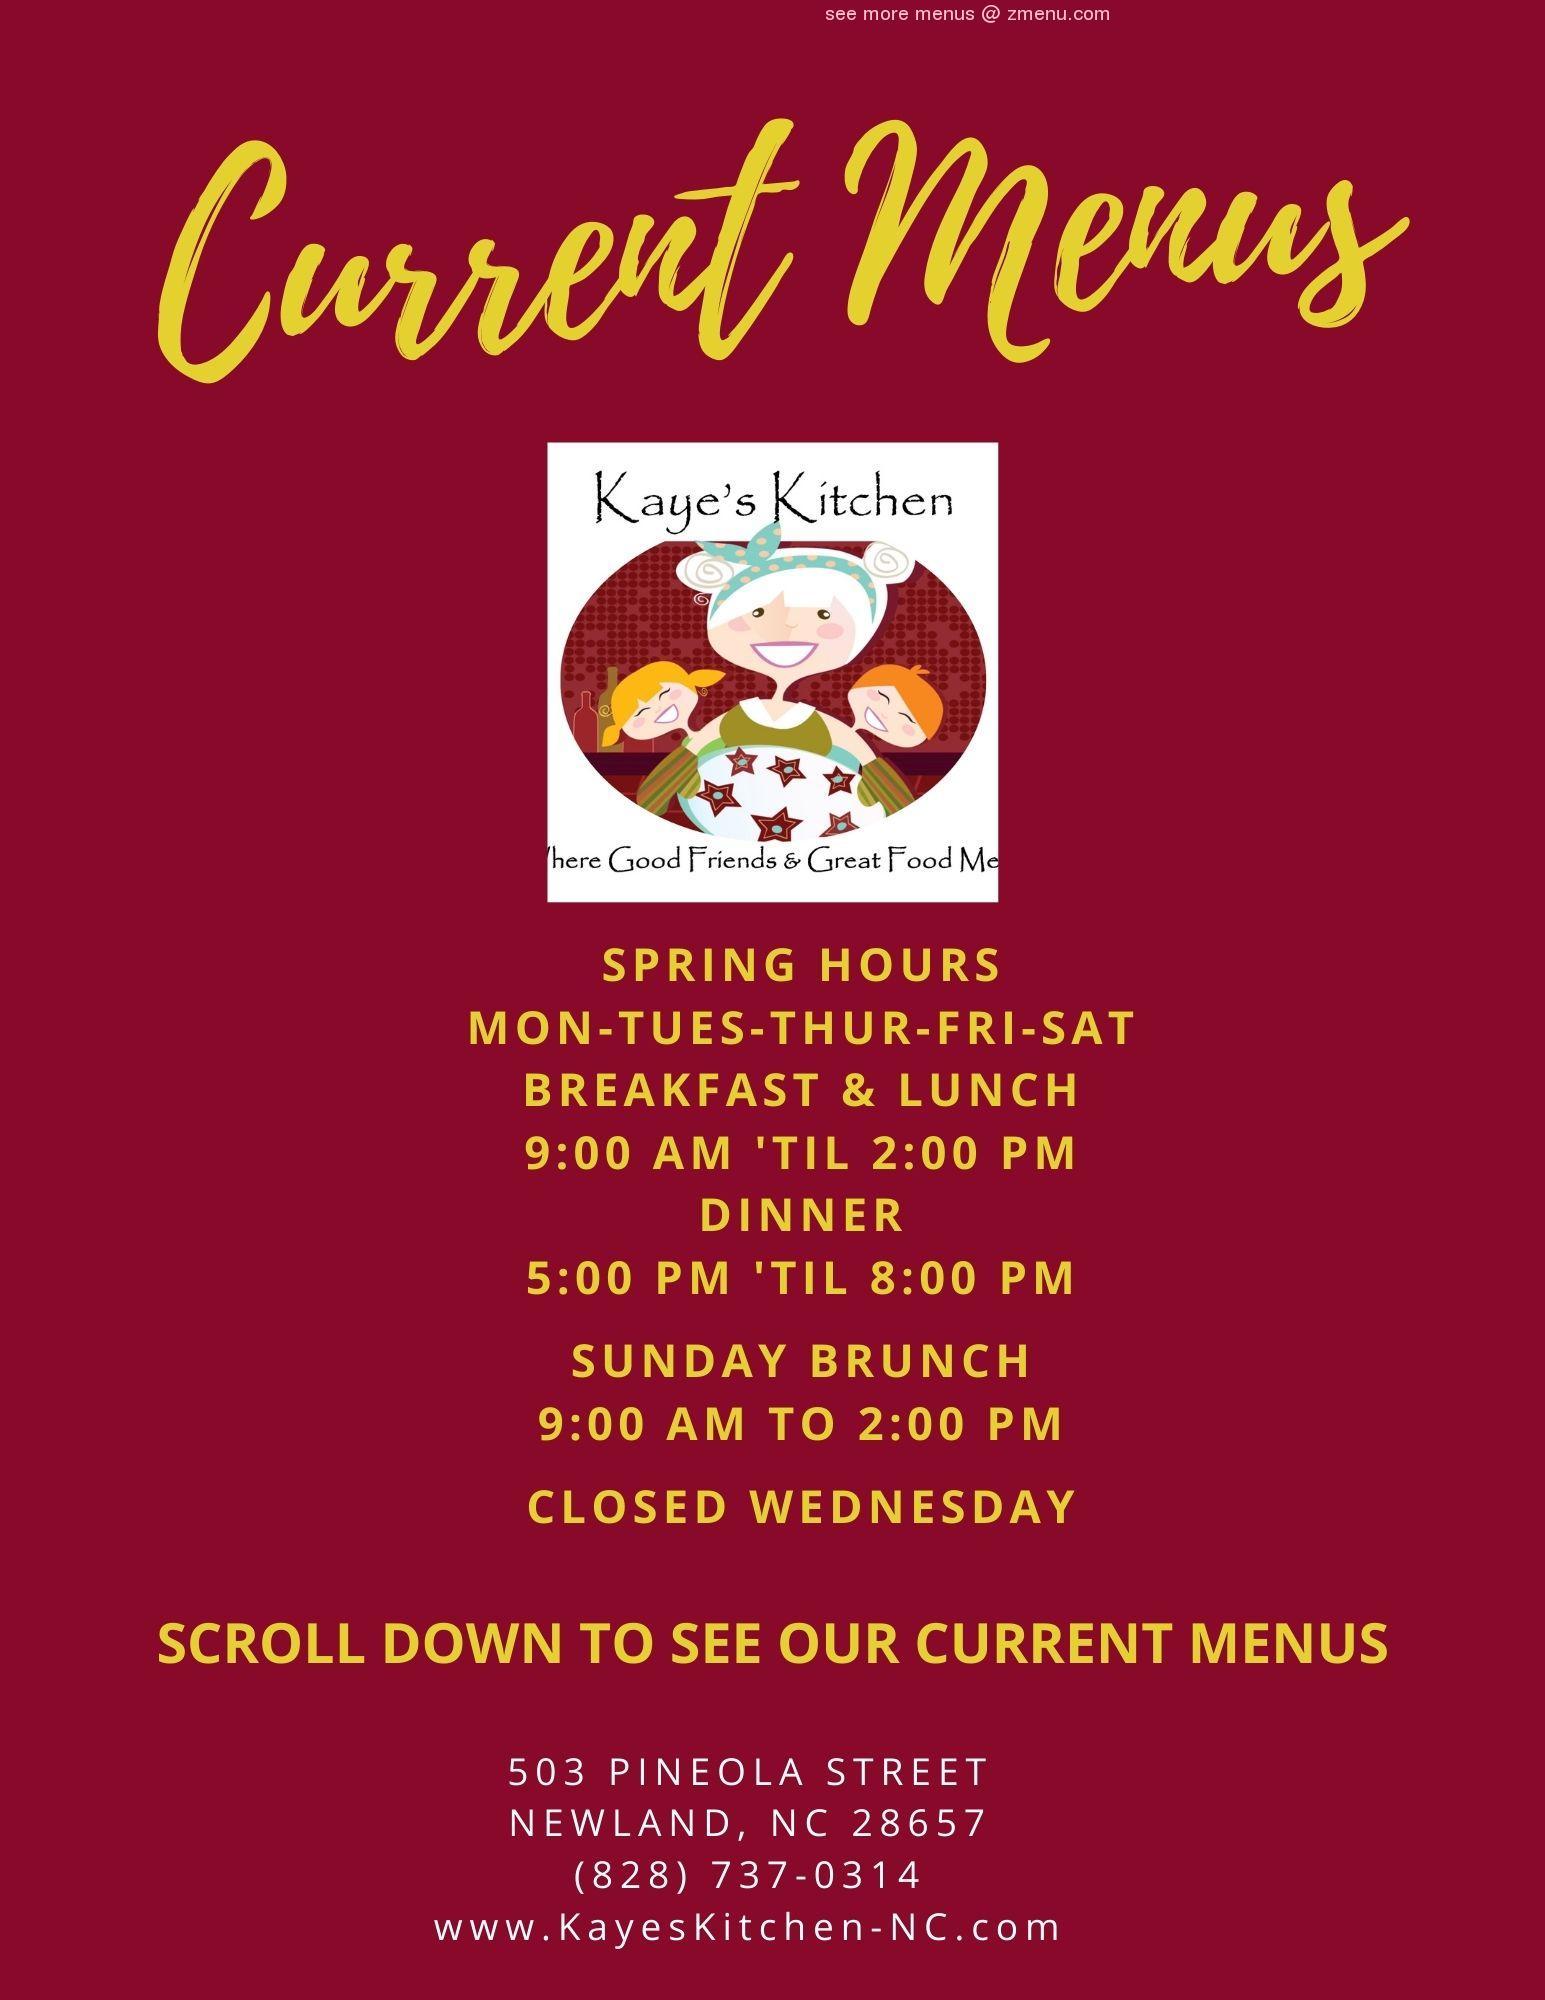 Online Menu Of Kayes Kitchen Restaurant Newland North Carolina 28657 Zmenu